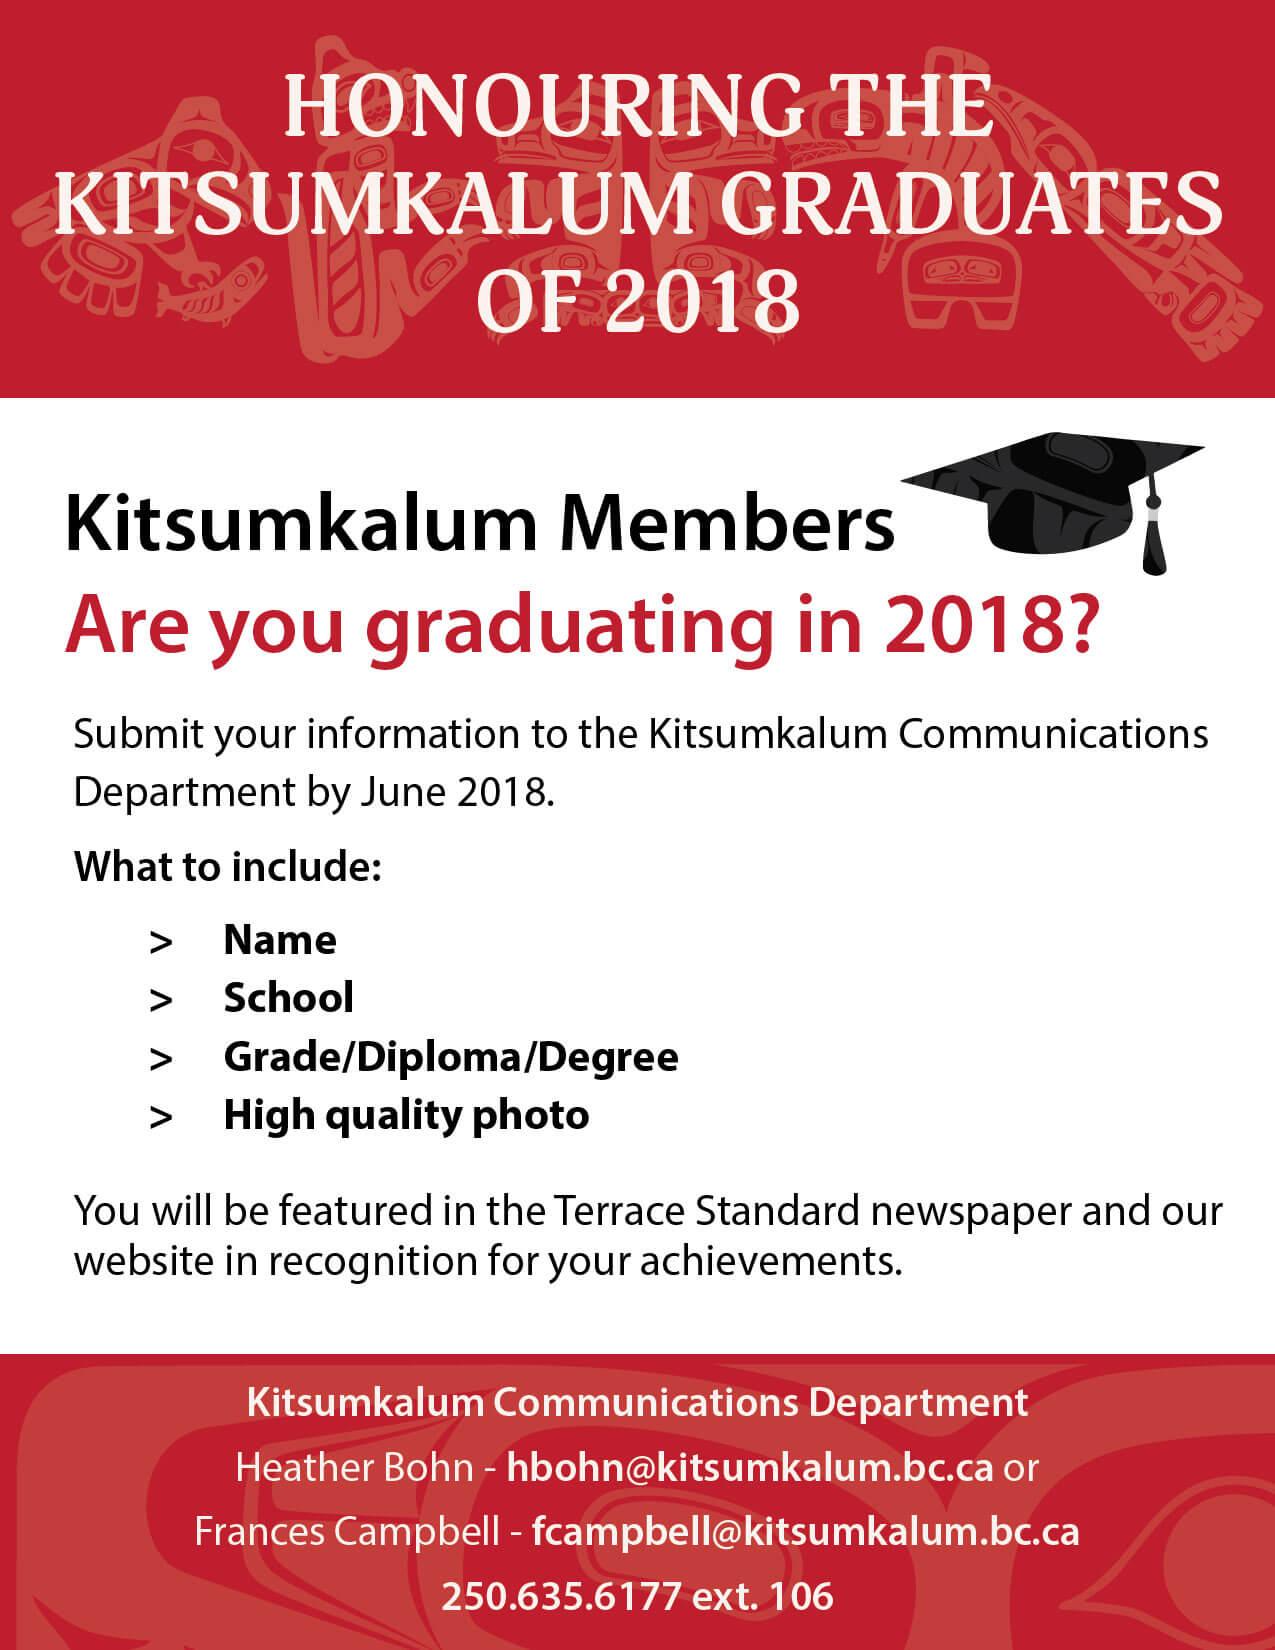 Honouring Kitsumkalum Graduates 2018